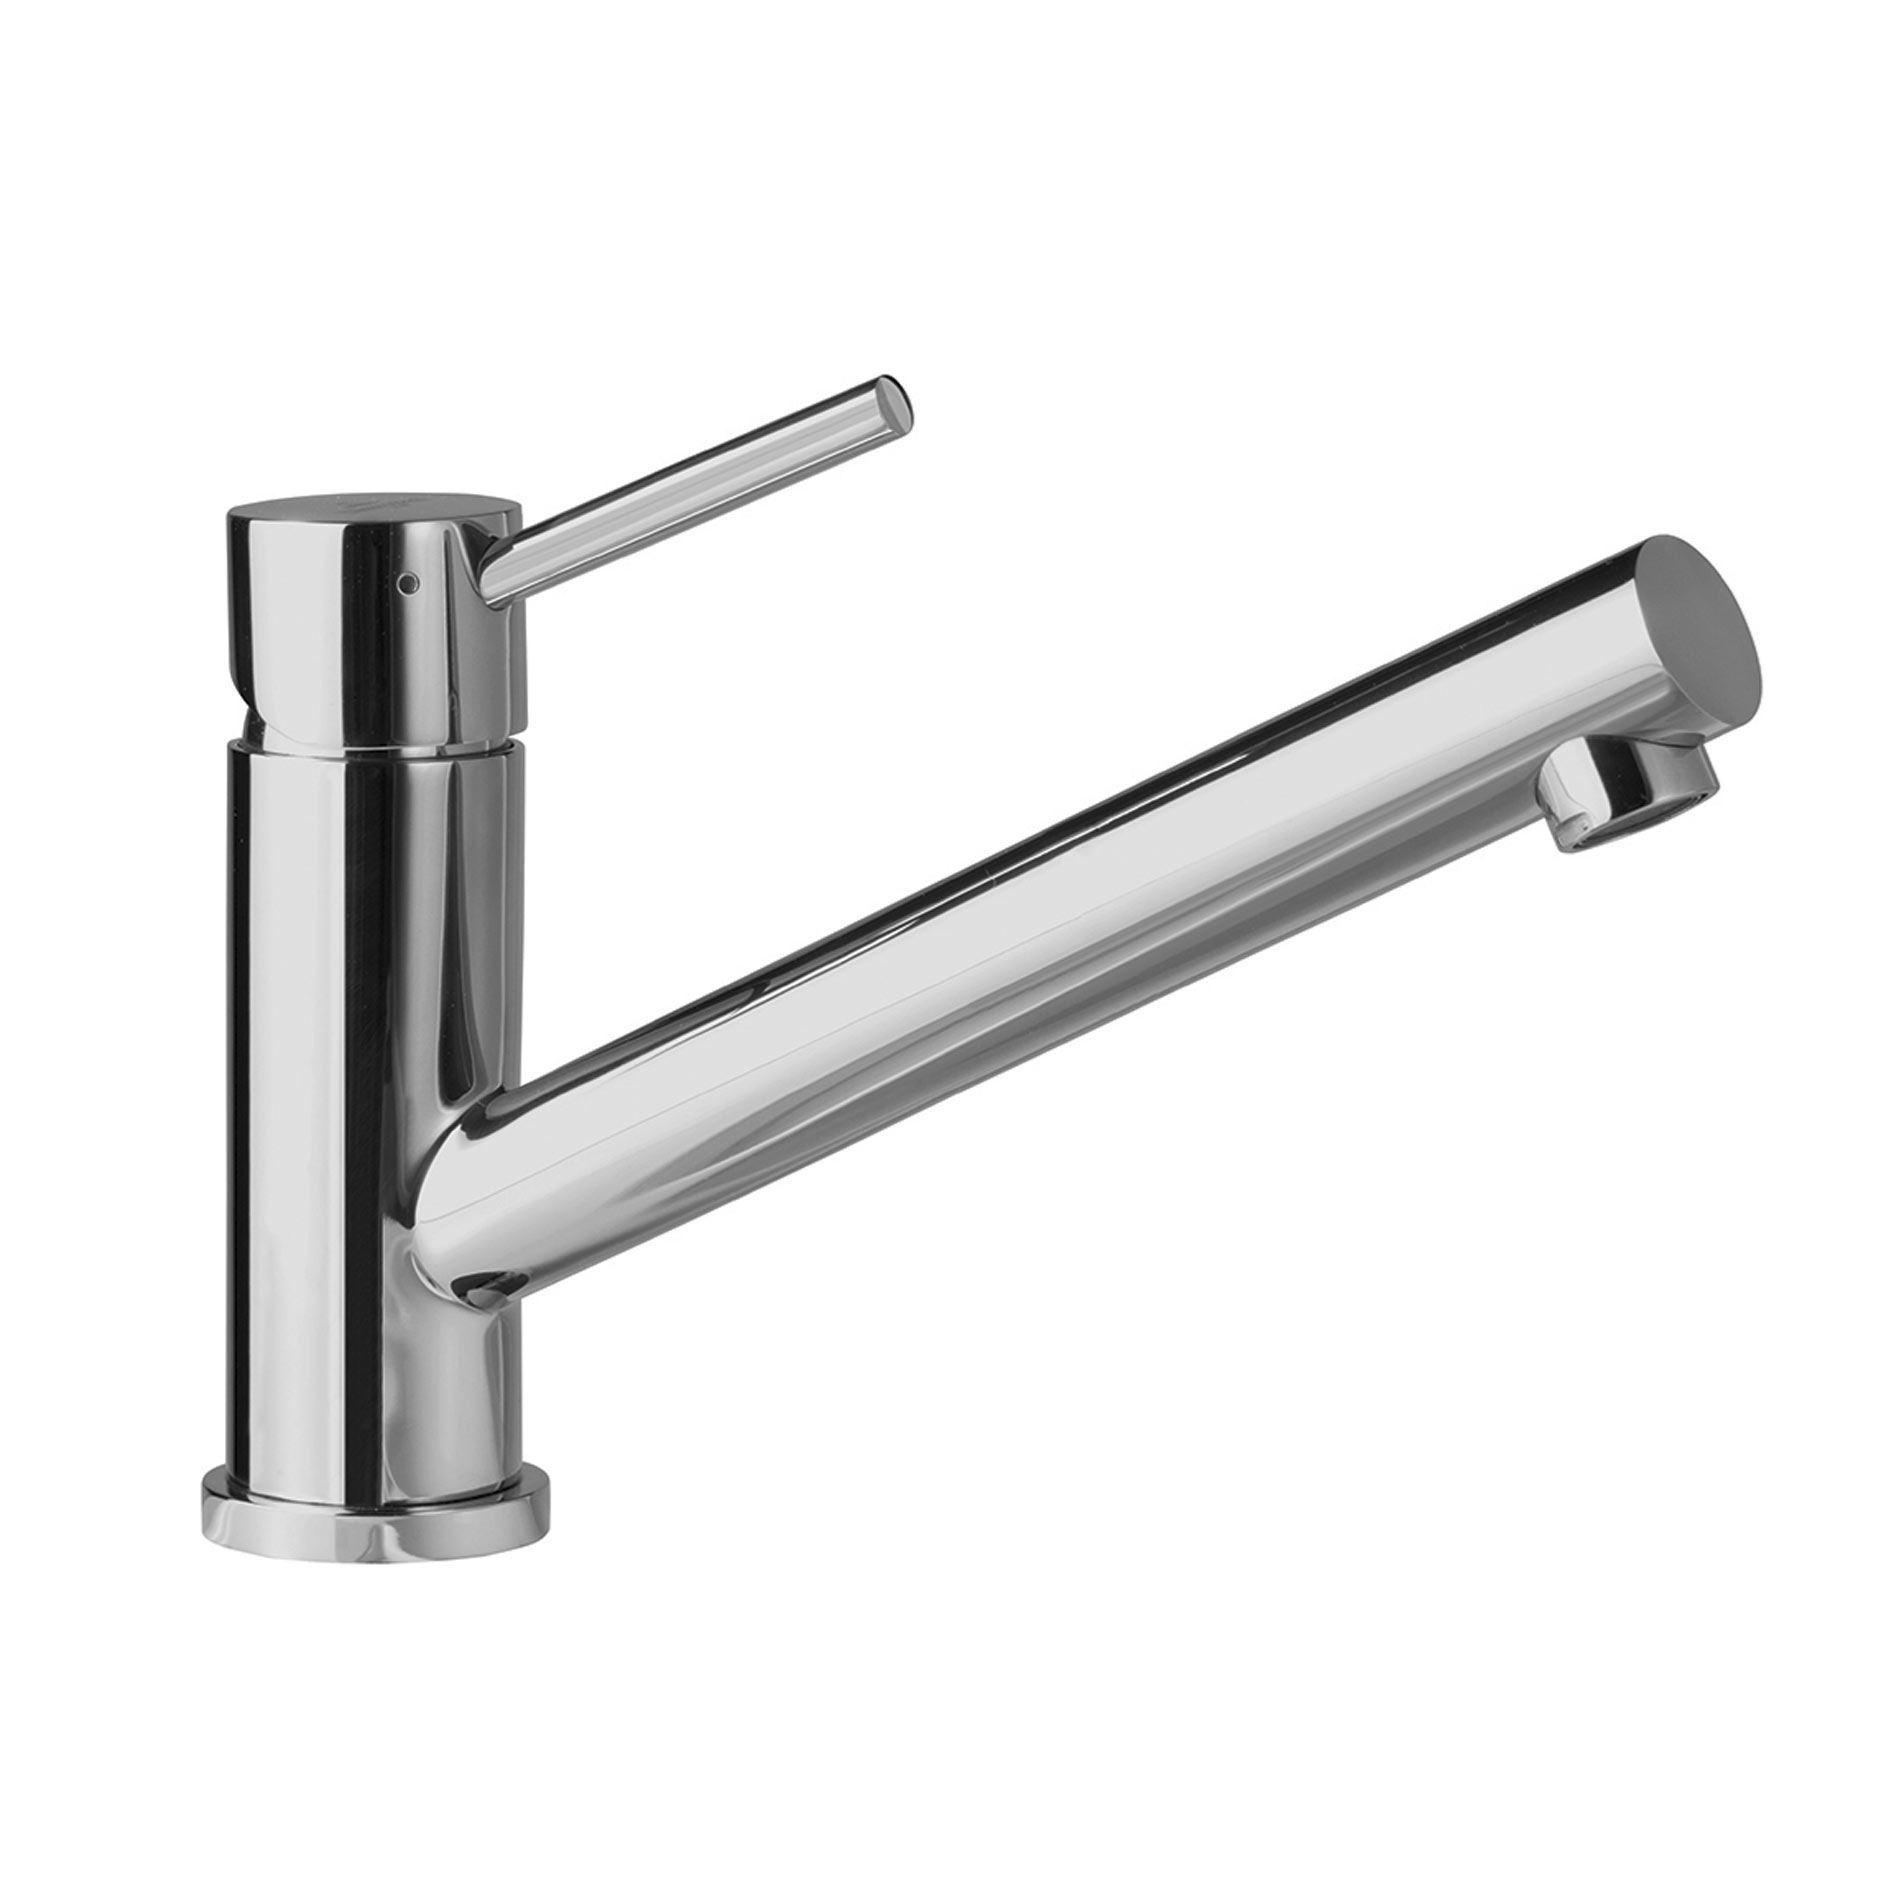 Villeroy & Boch: Como Monobloc Tap - Kitchen Sinks & Taps